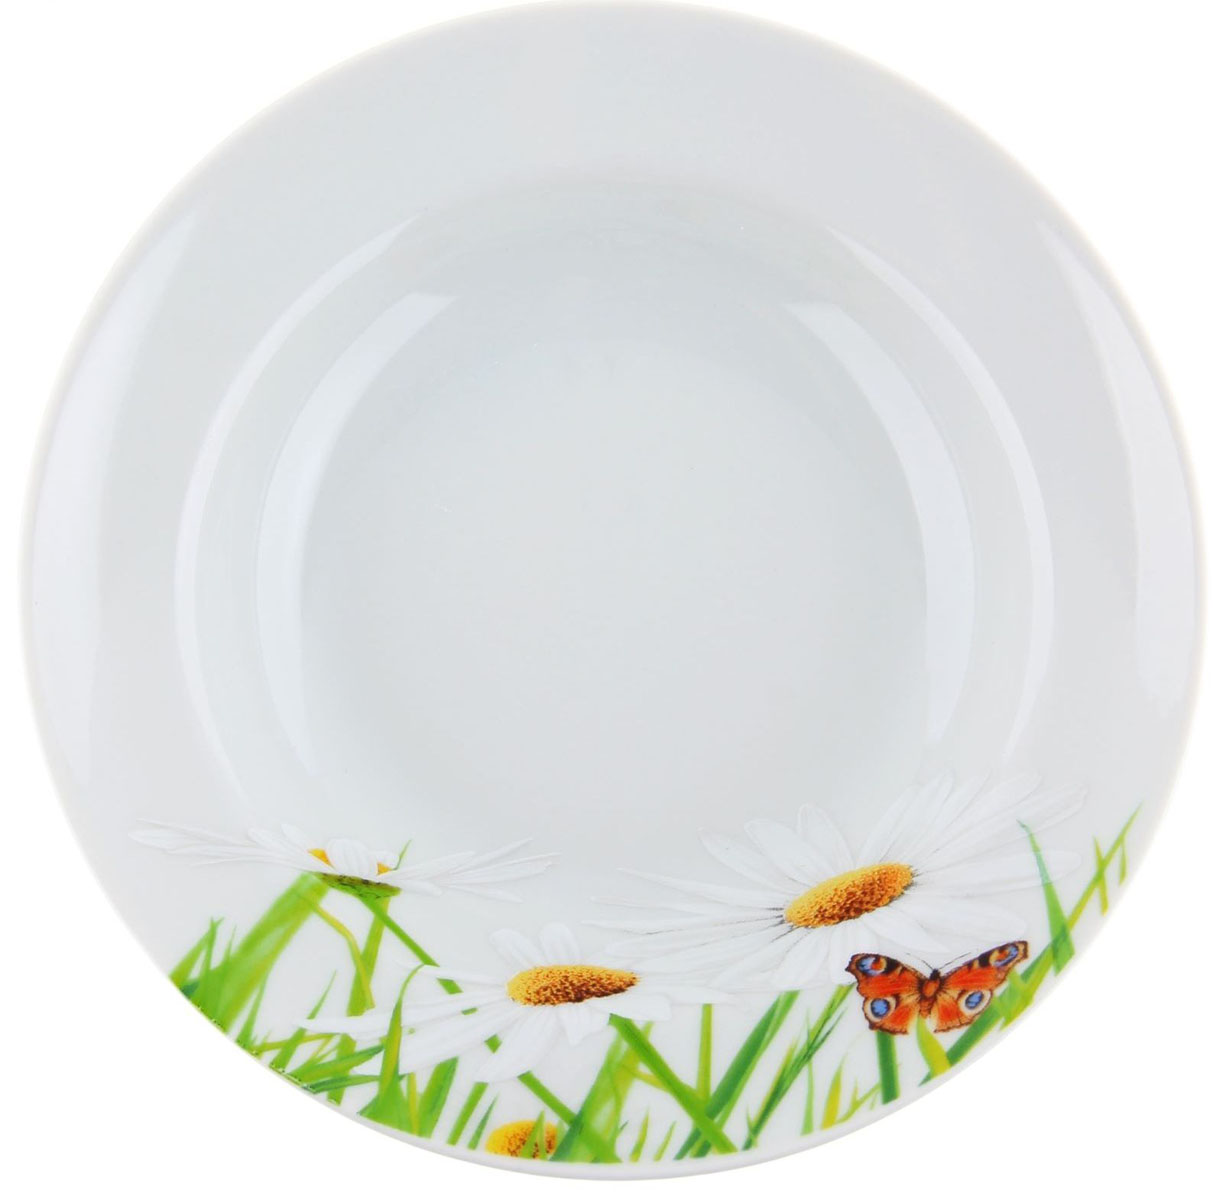 Тарелка глубокая Идиллия. Ромашка, диаметр 20 см1280309